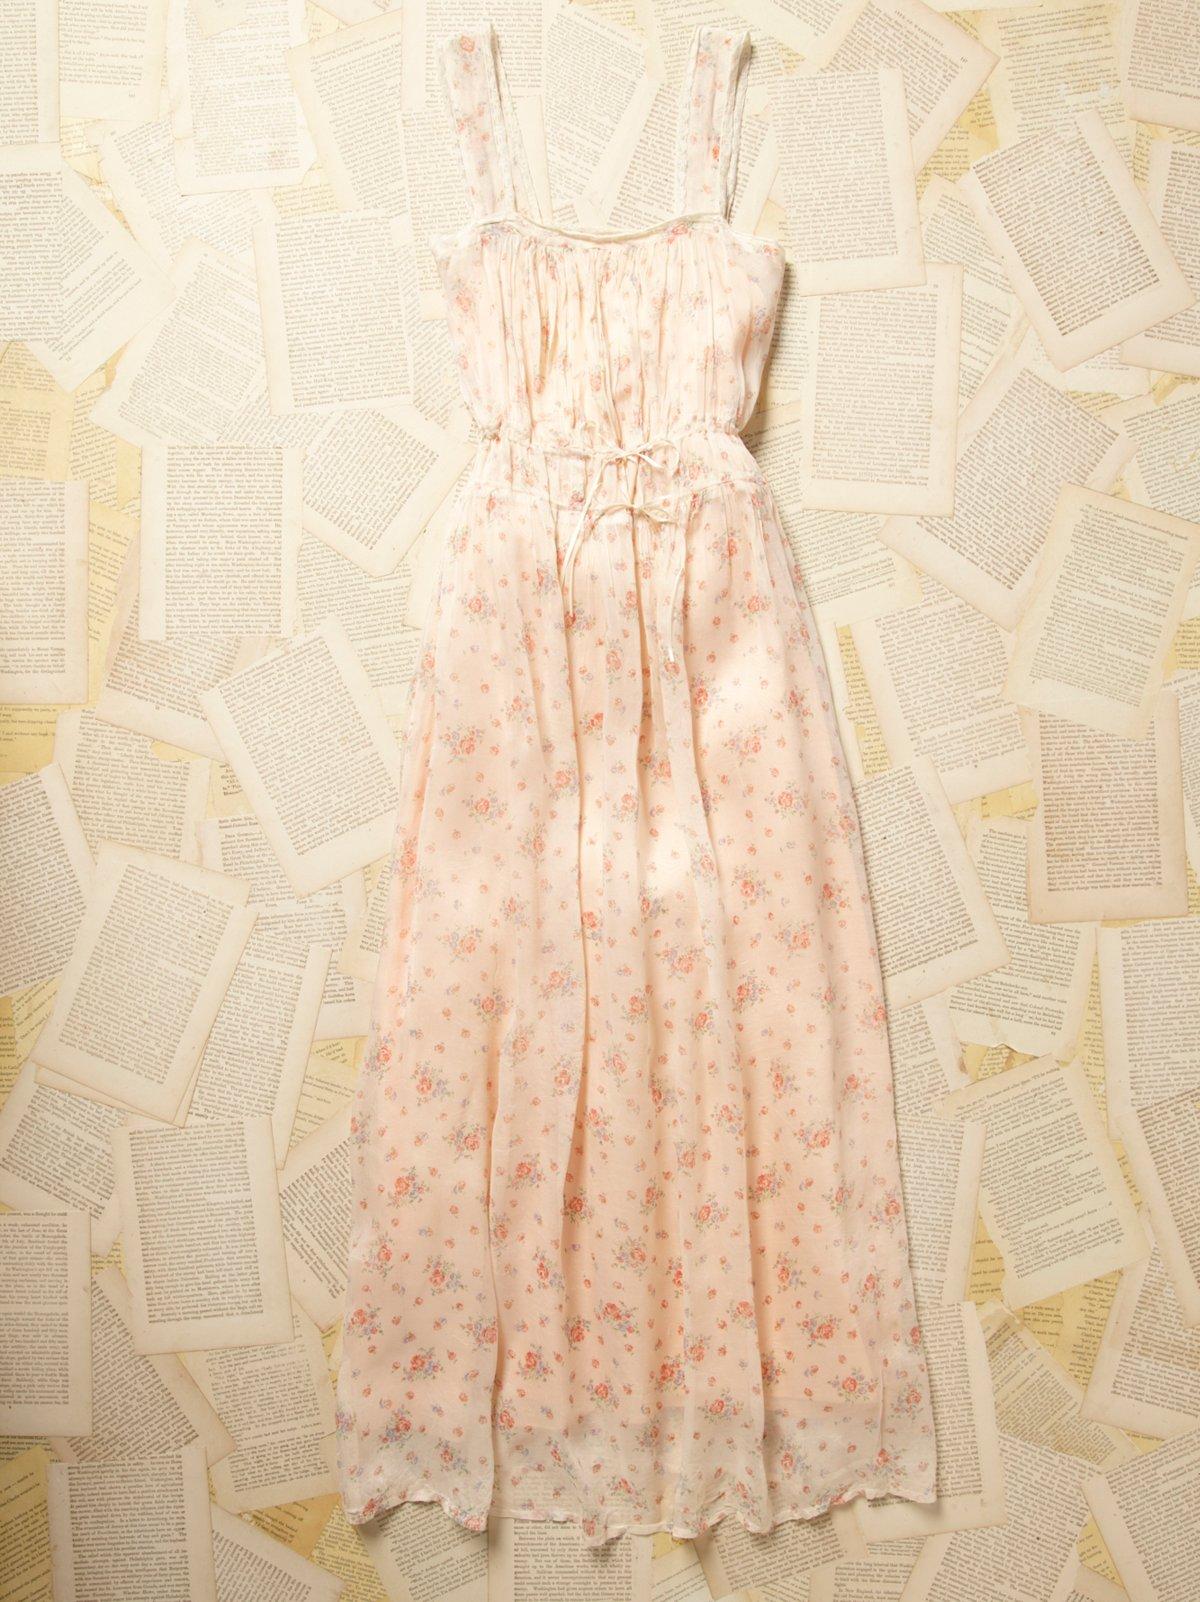 Vintage 1960s Floral Print Dress